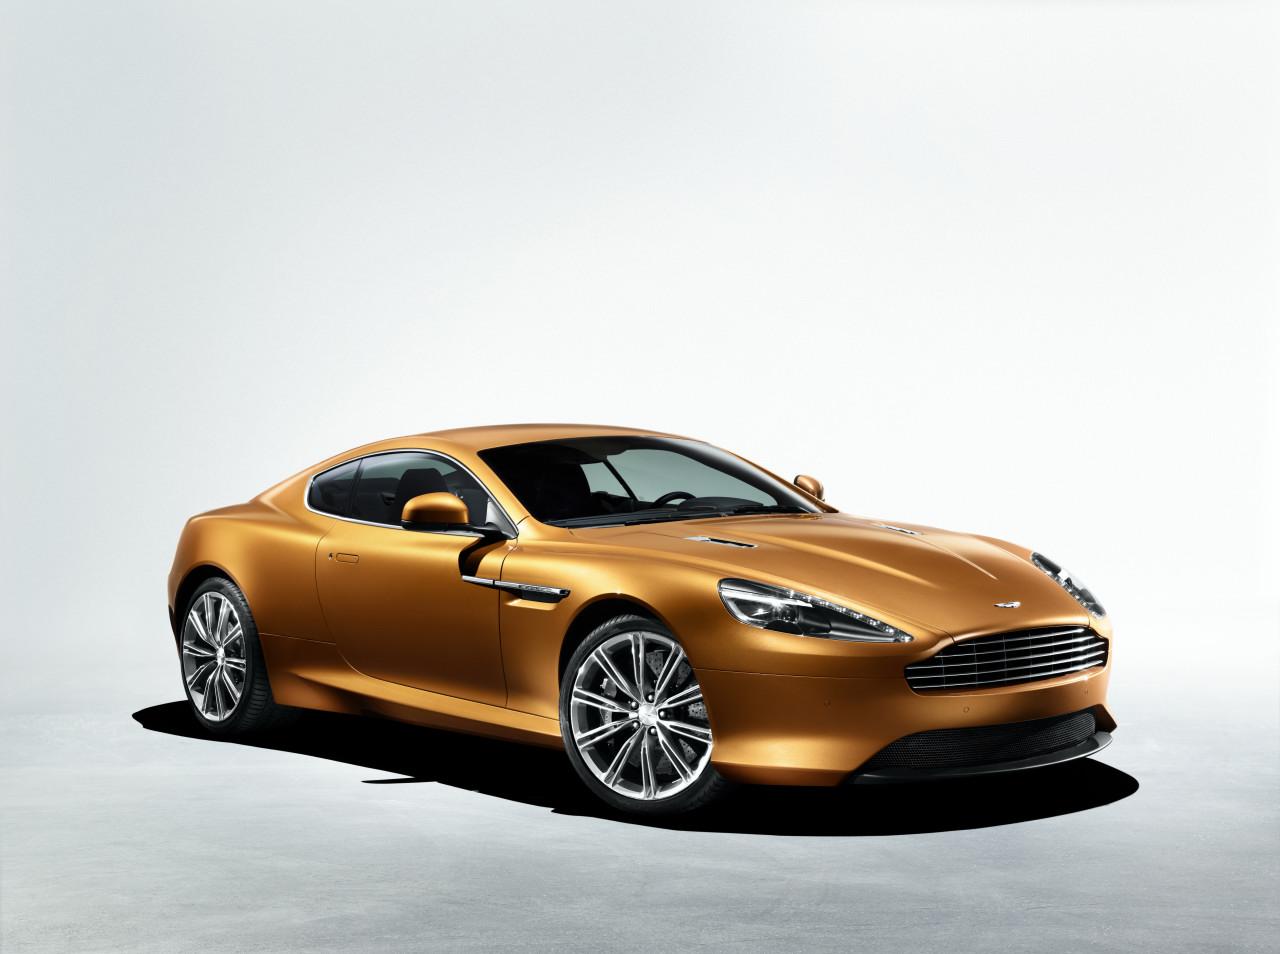 Luxury Car 2013 Aston Martin Virage Coupe Review